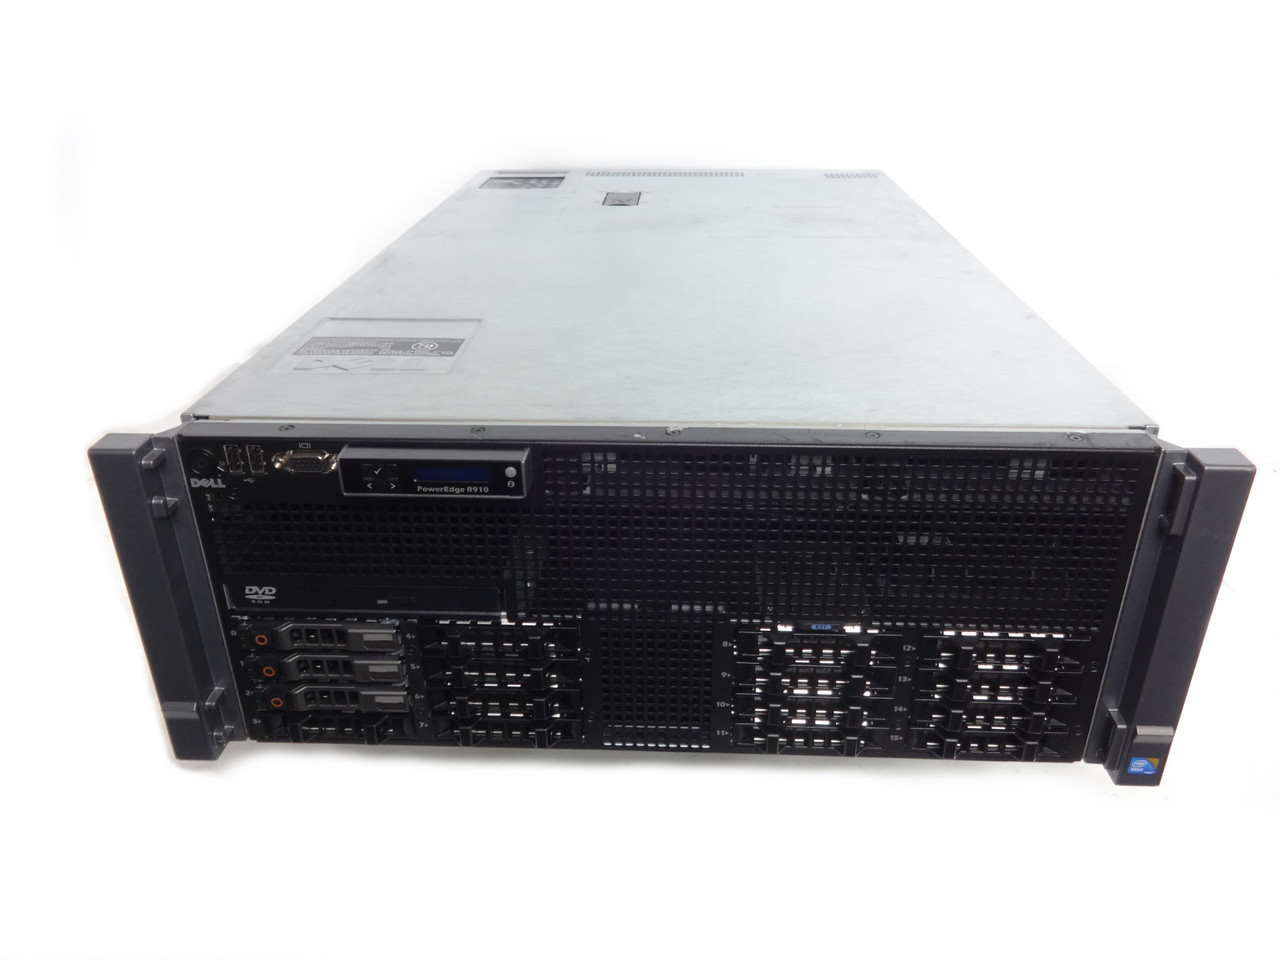 Dell Poweredge R910 Server